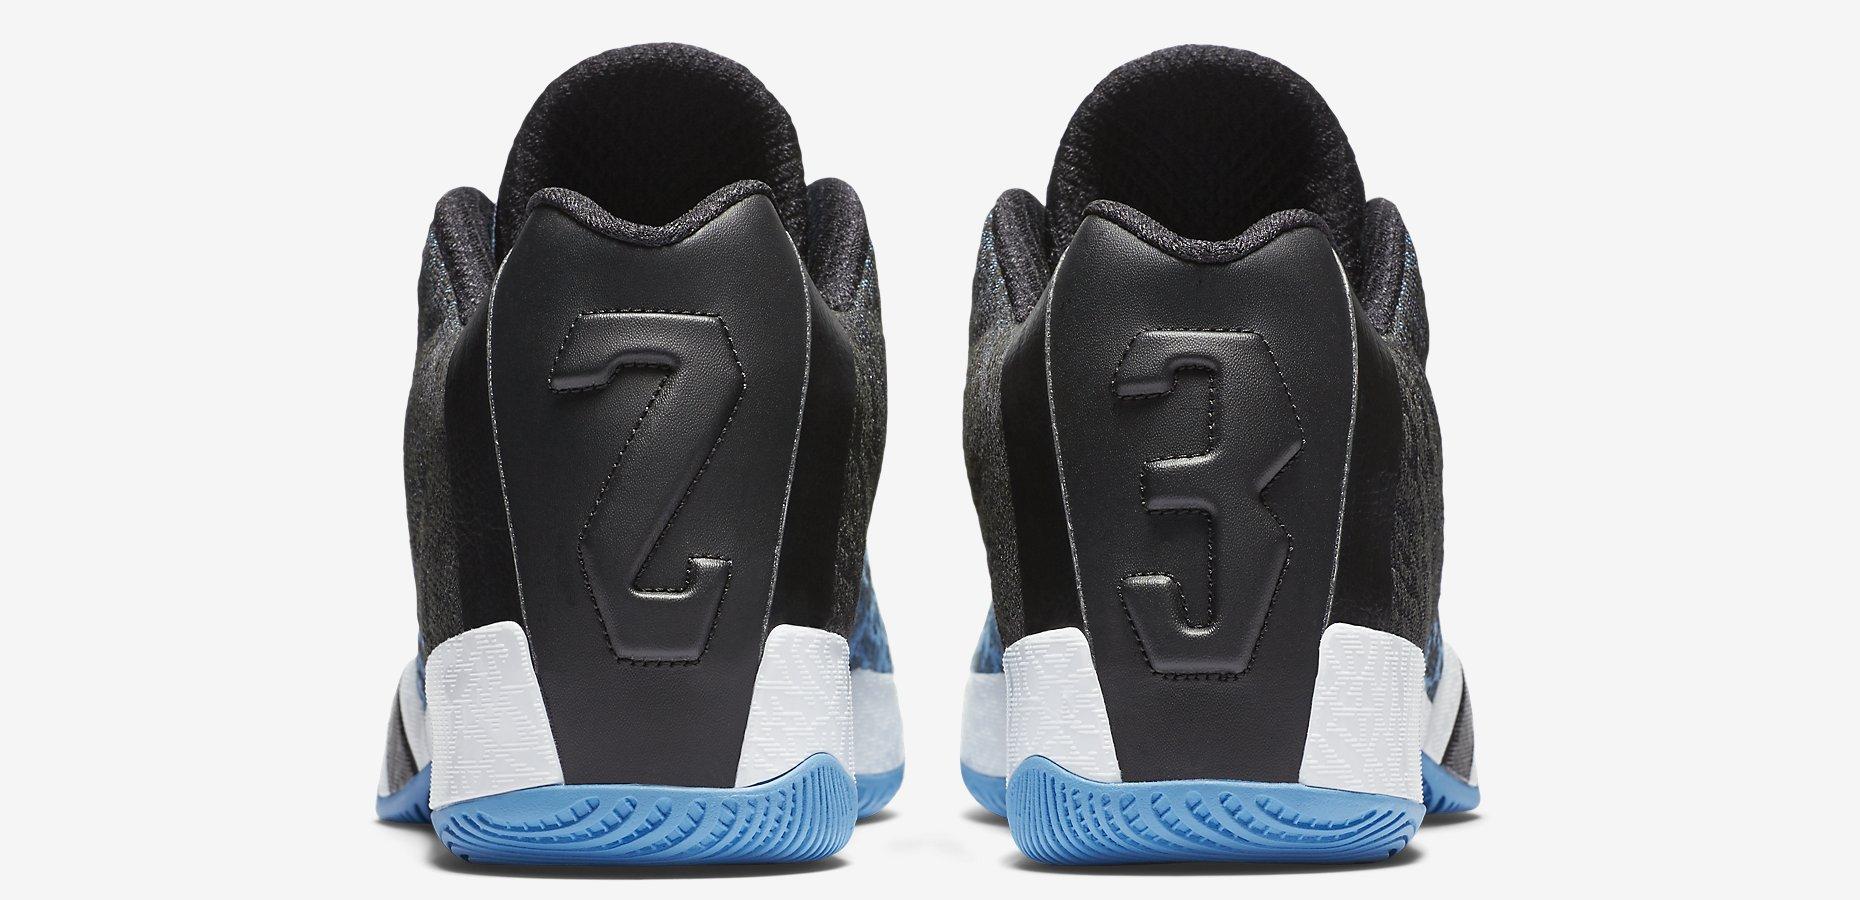 5a771b96718 Nike Air Jordan XX9 29 UNC PE Unreleased Promo Sample Men's Size 16 –  742965-014